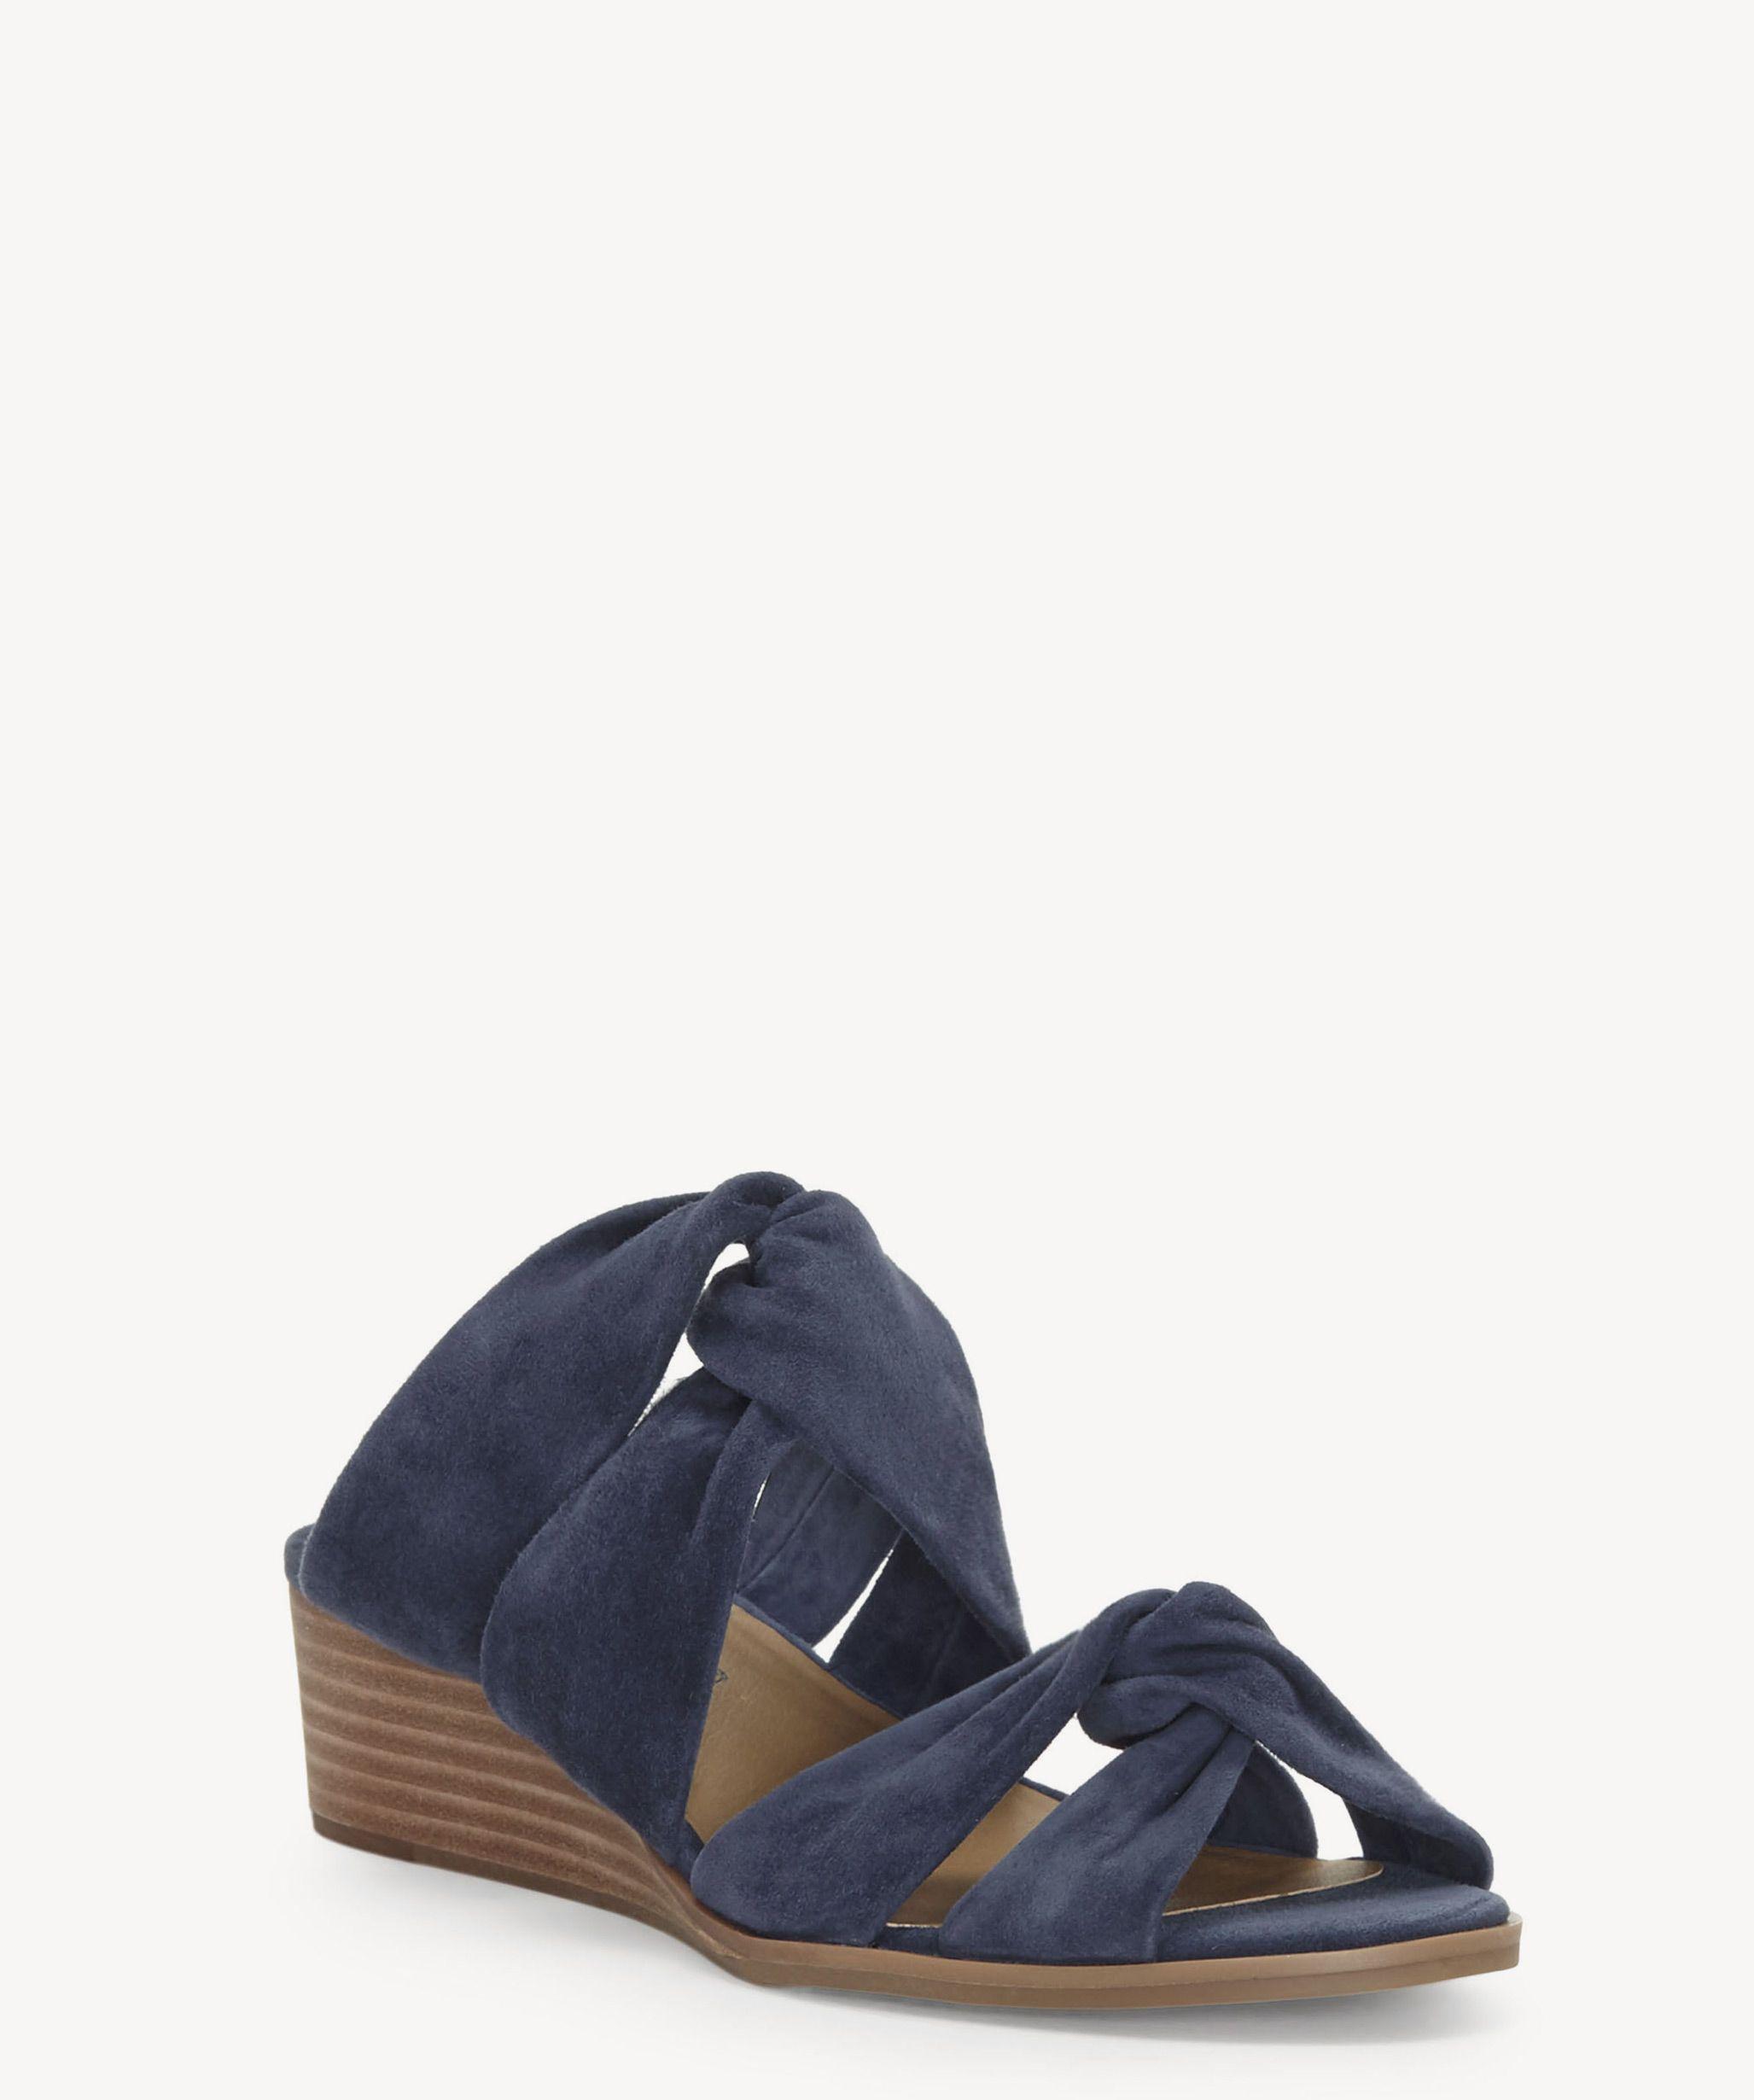 Lucky Brand Rhilley Suede Wedge Sandals 0v2V7Ob5